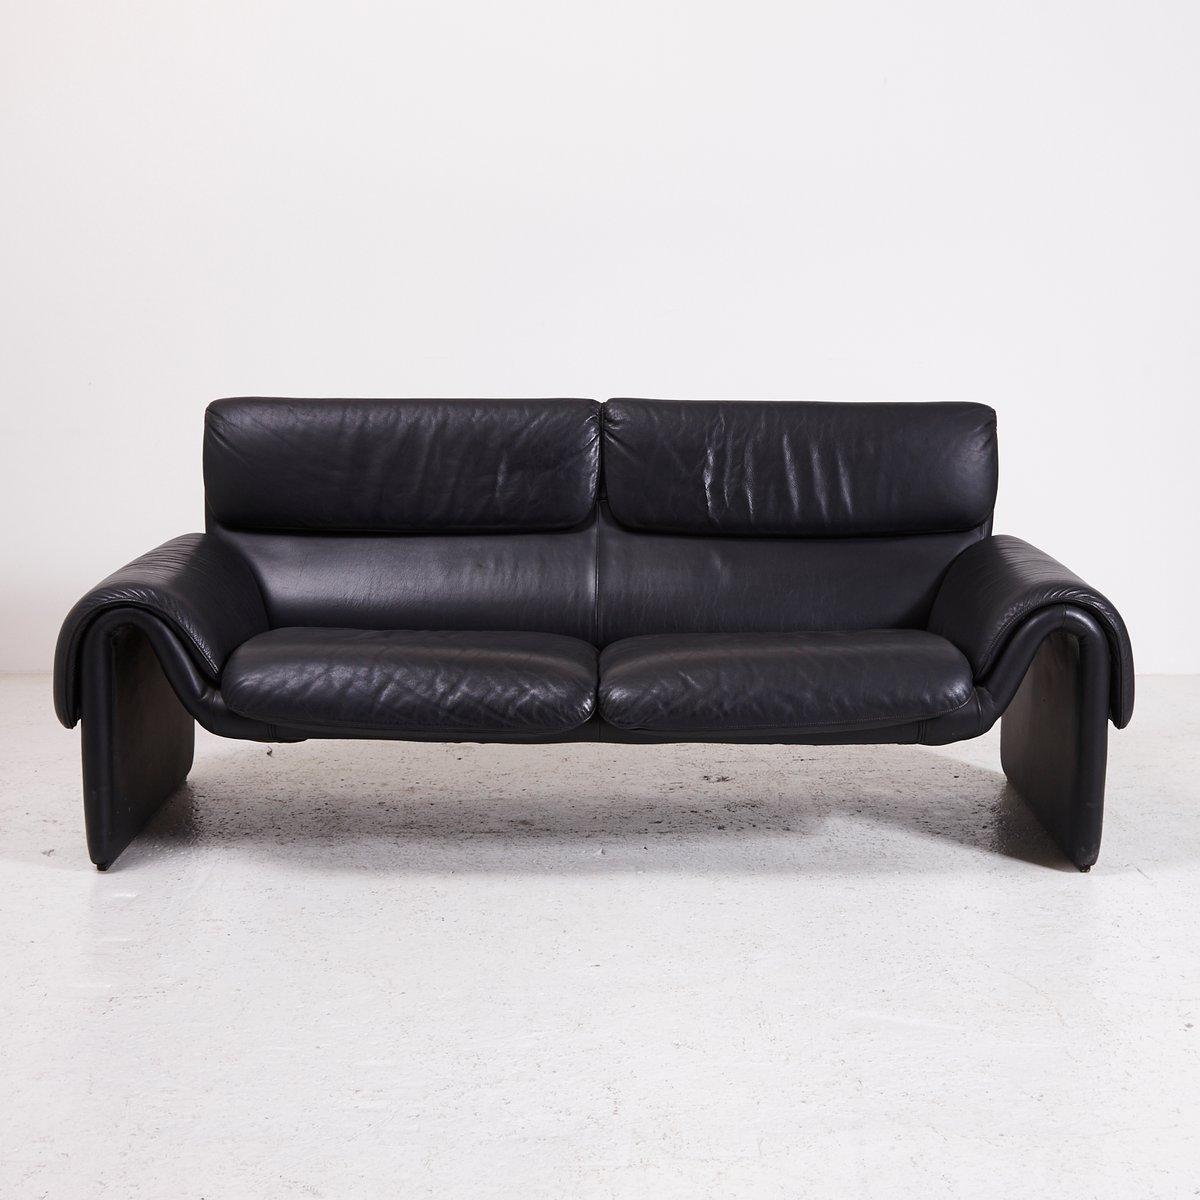 modell ds2011 2 sitzer sofa von de sede bei pamono kaufen. Black Bedroom Furniture Sets. Home Design Ideas